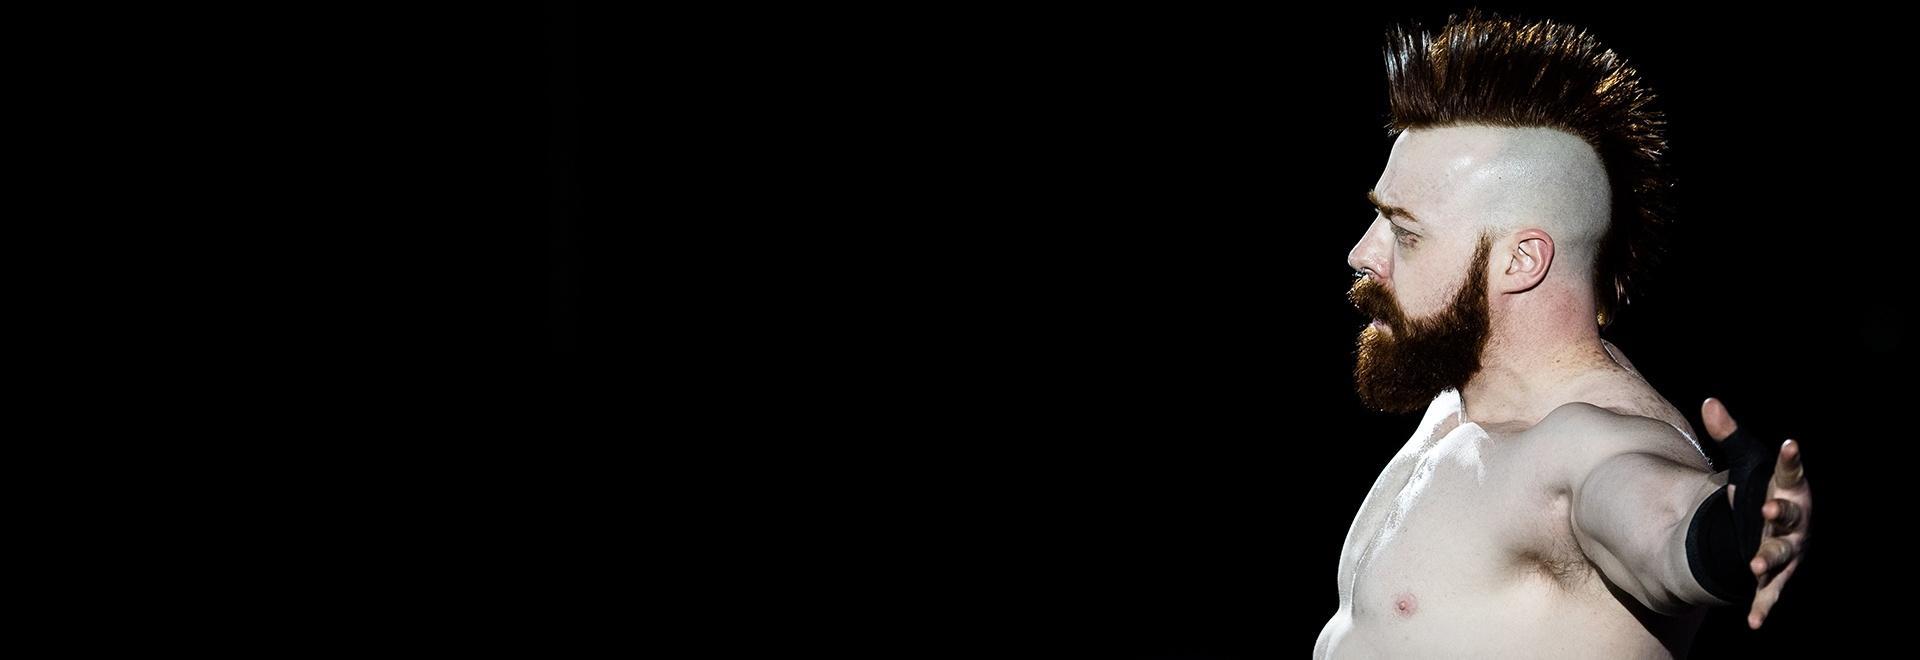 Ep. 48